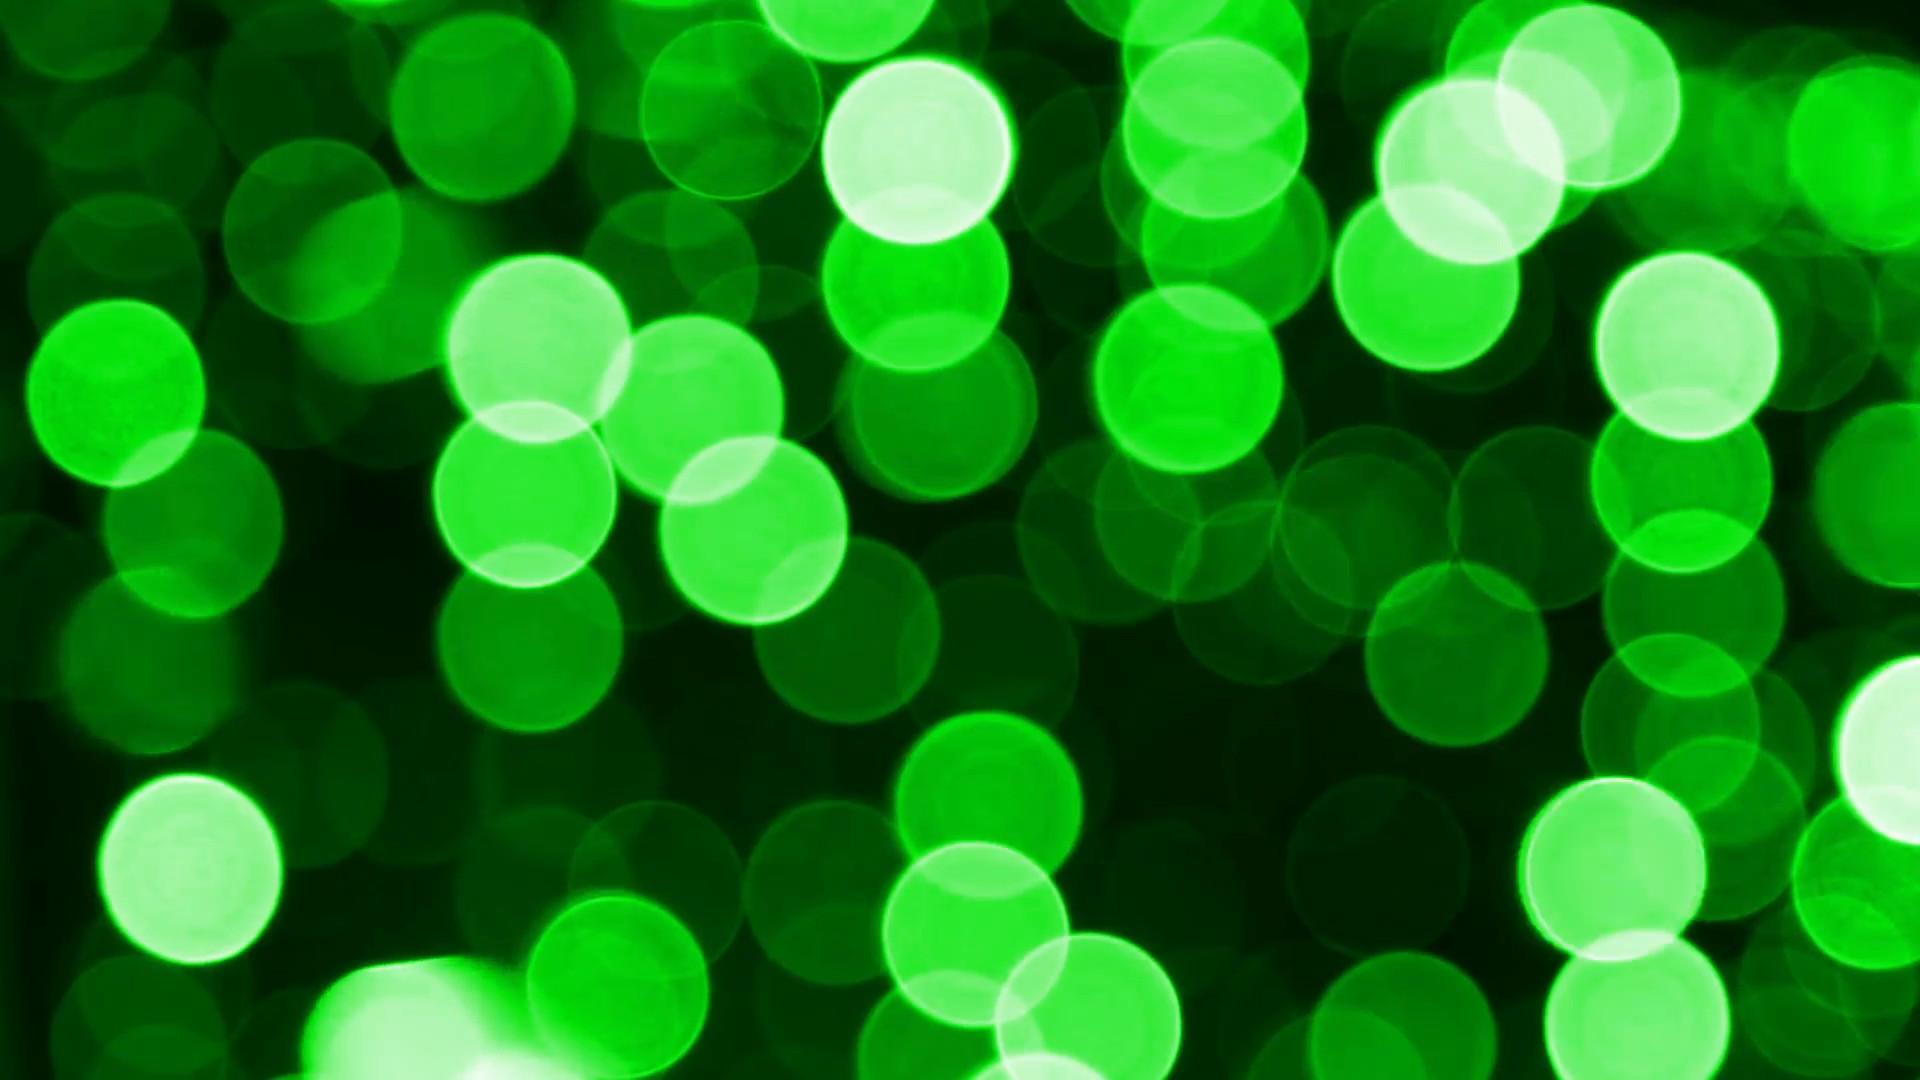 Png Light Effects | ohidul.me